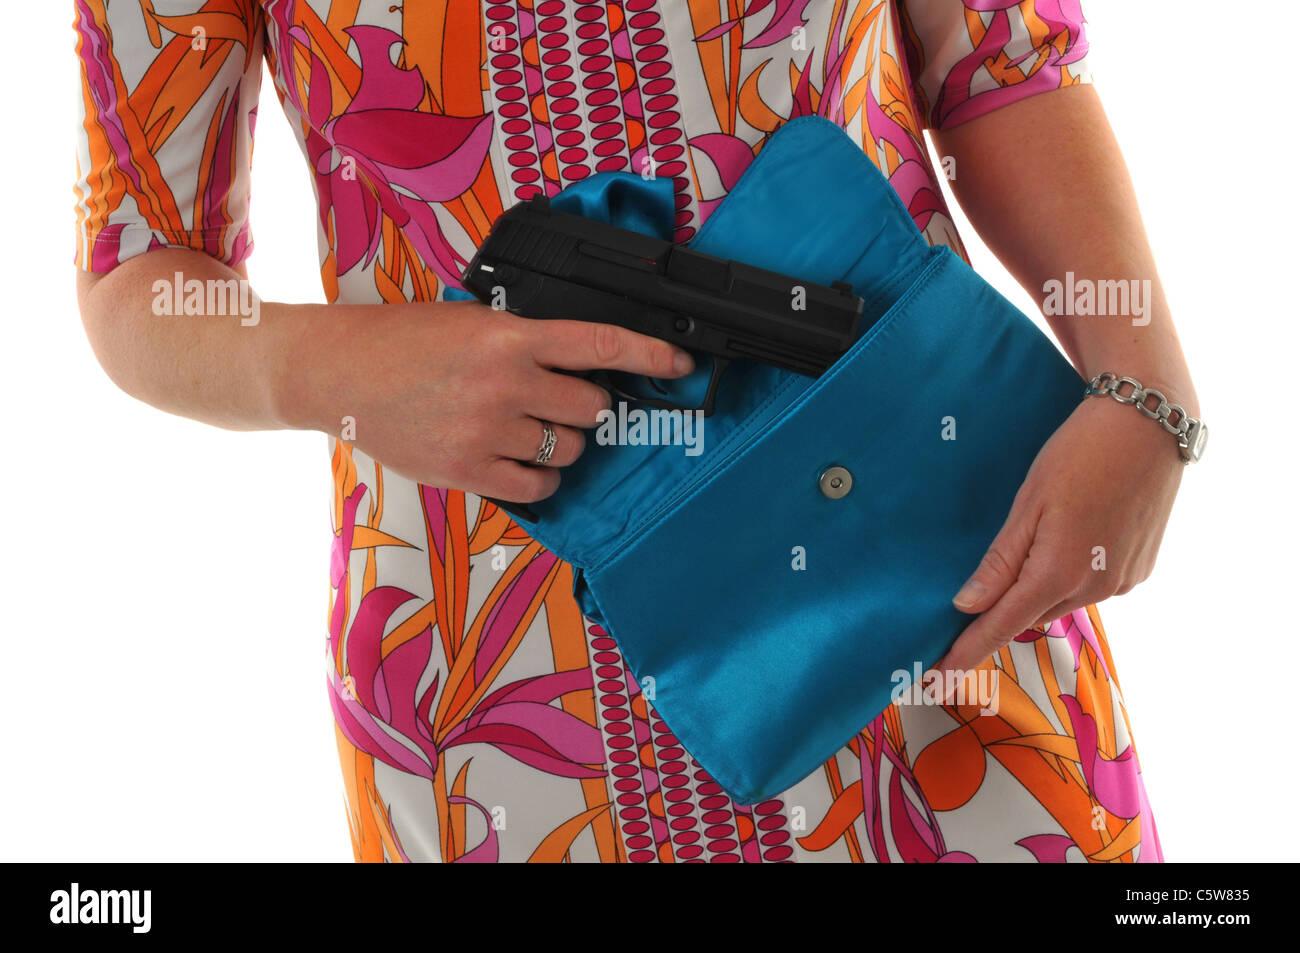 Woman with a gun,  woman with handgun in her handbag - Stock Image